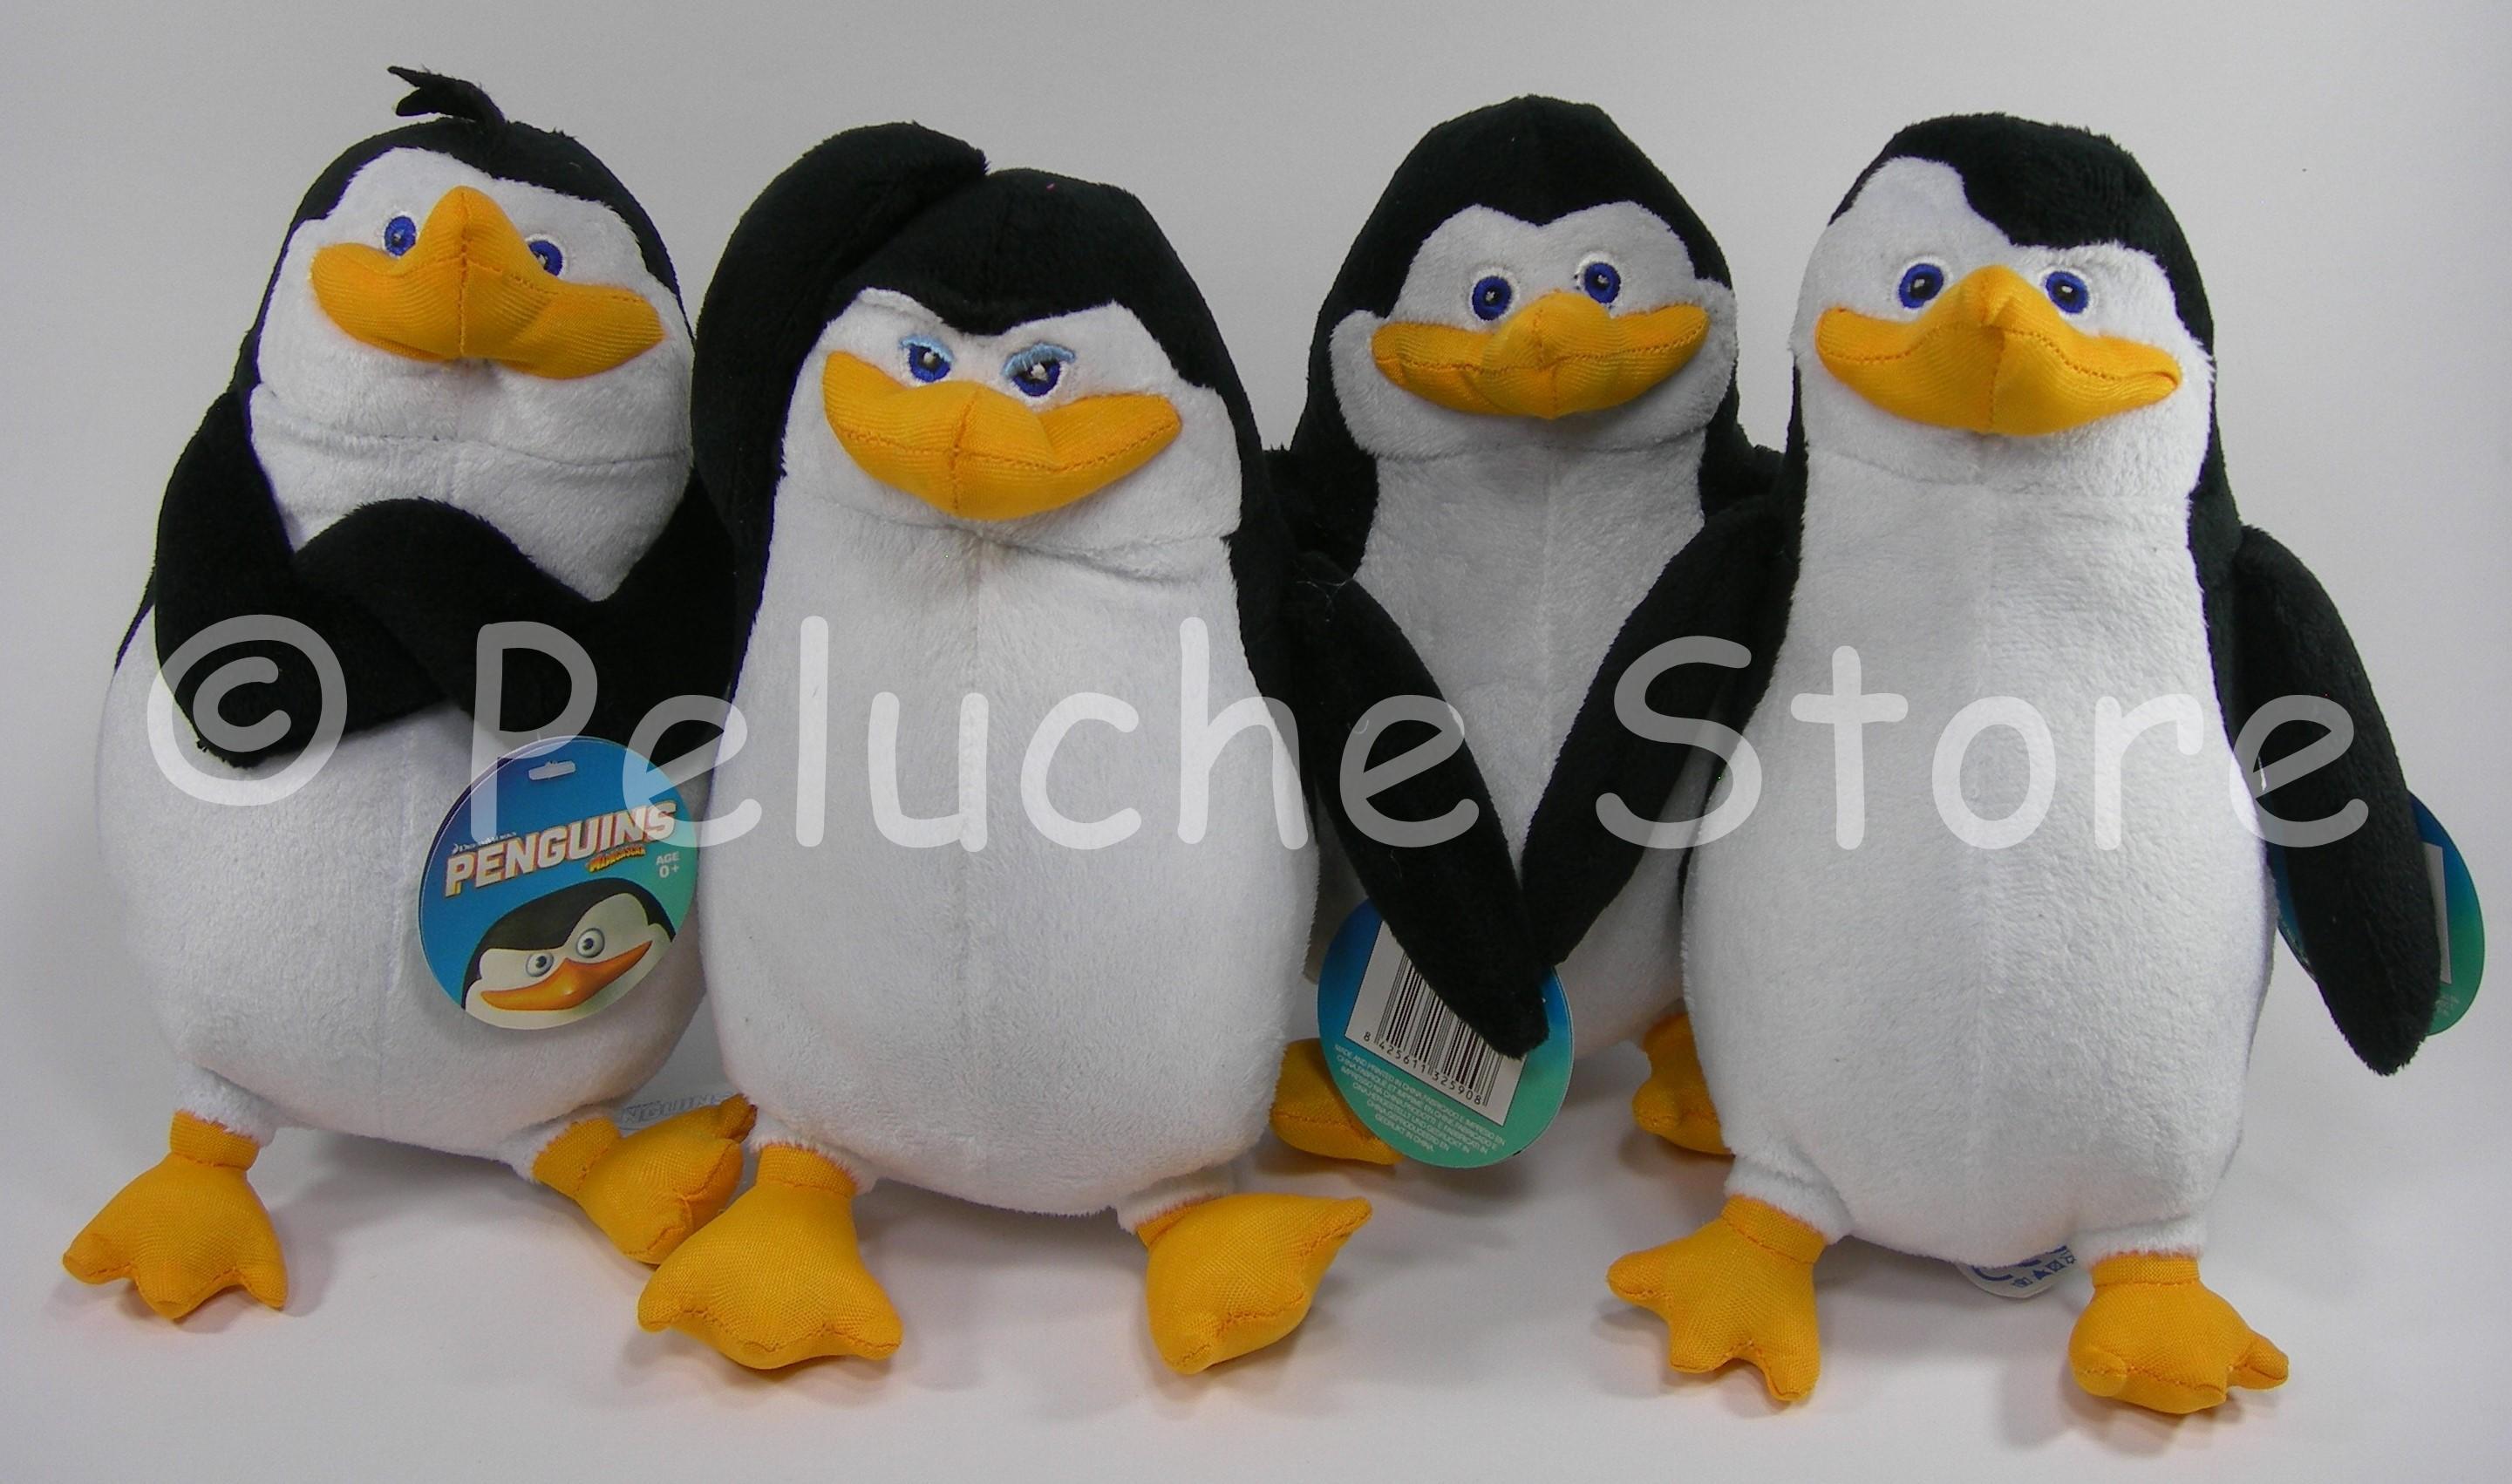 Pinguini di Madagascar peluche 22 cm velluto Rico Kowasky Soldato Skipper